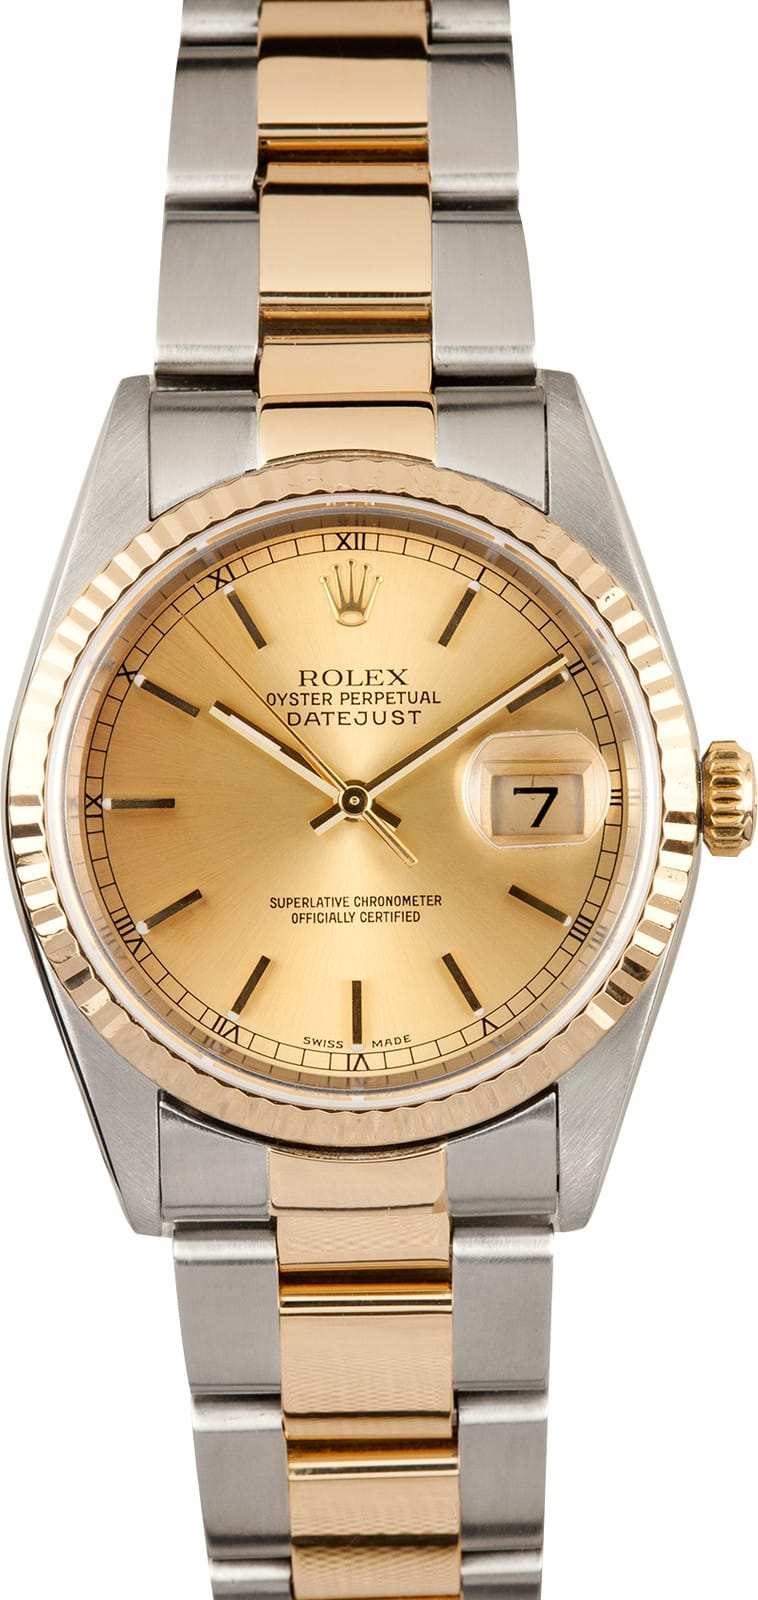 Used Rolex Submariner >> Rolex Datejust Two Tone 16233